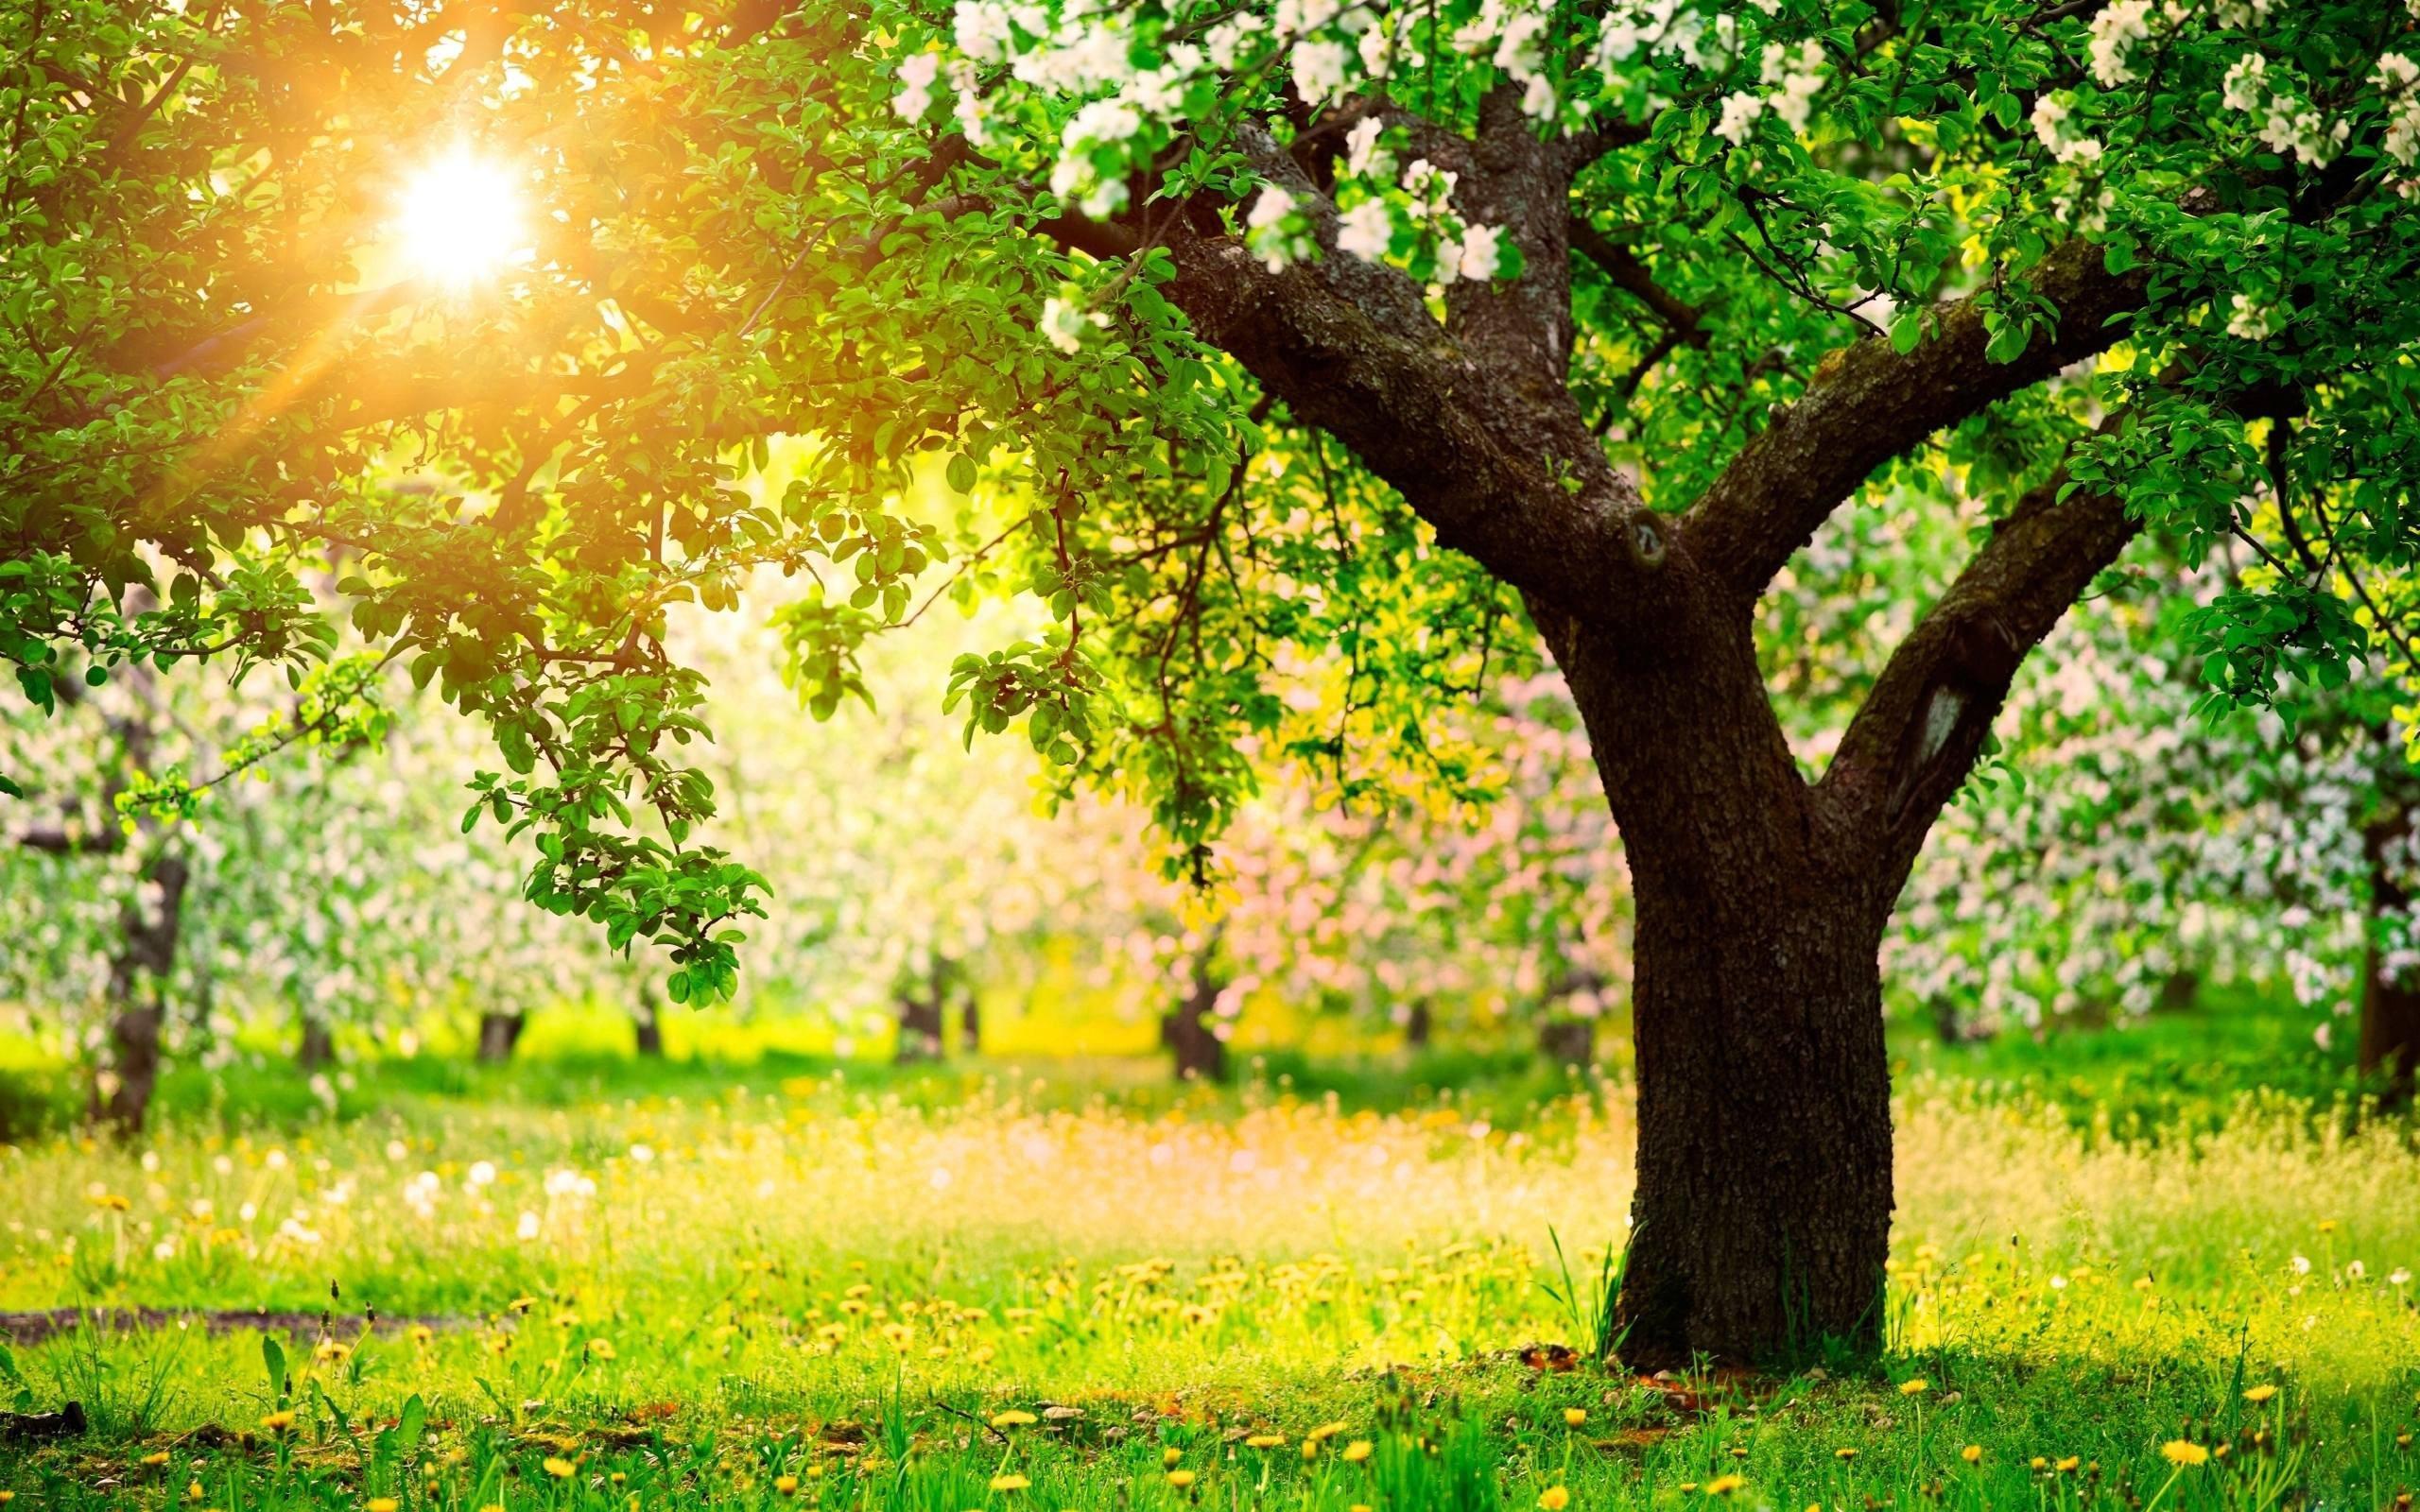 Beautiful Spring Nature Desktop Wallpapers – New HD Wallpapers